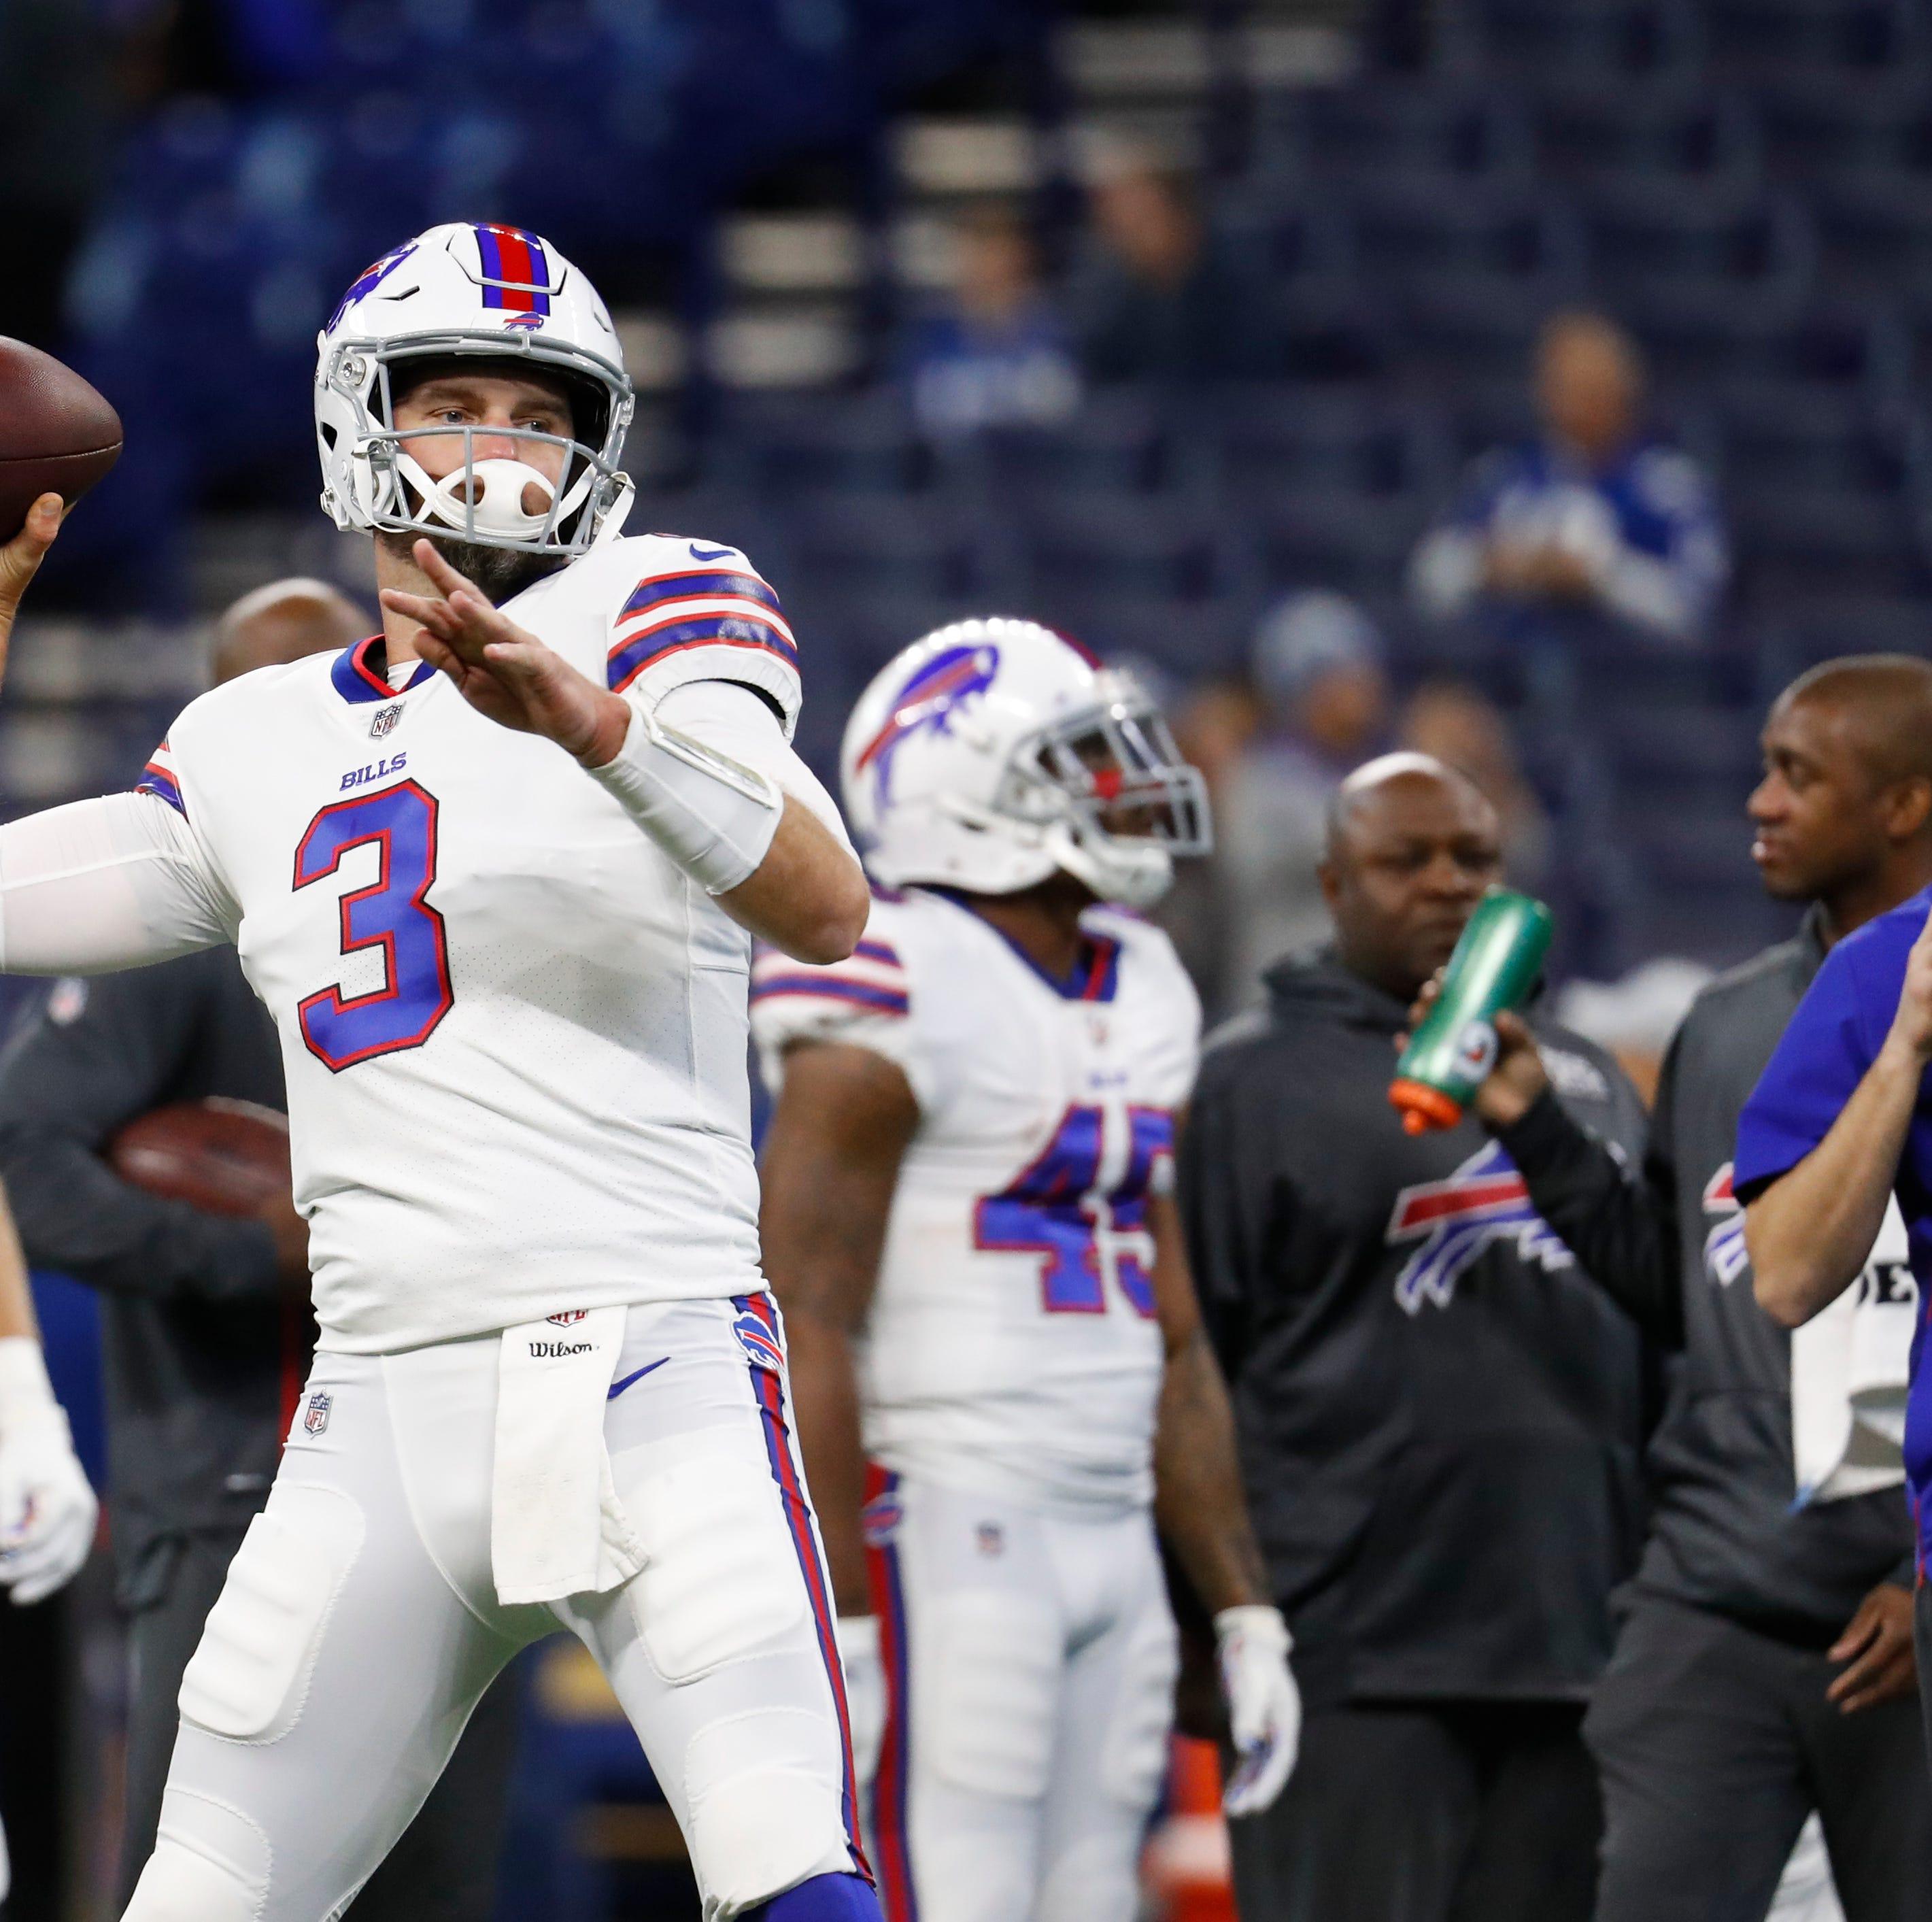 Final score and recap: Indianapolis Colts 37, Buffalo Bills 5